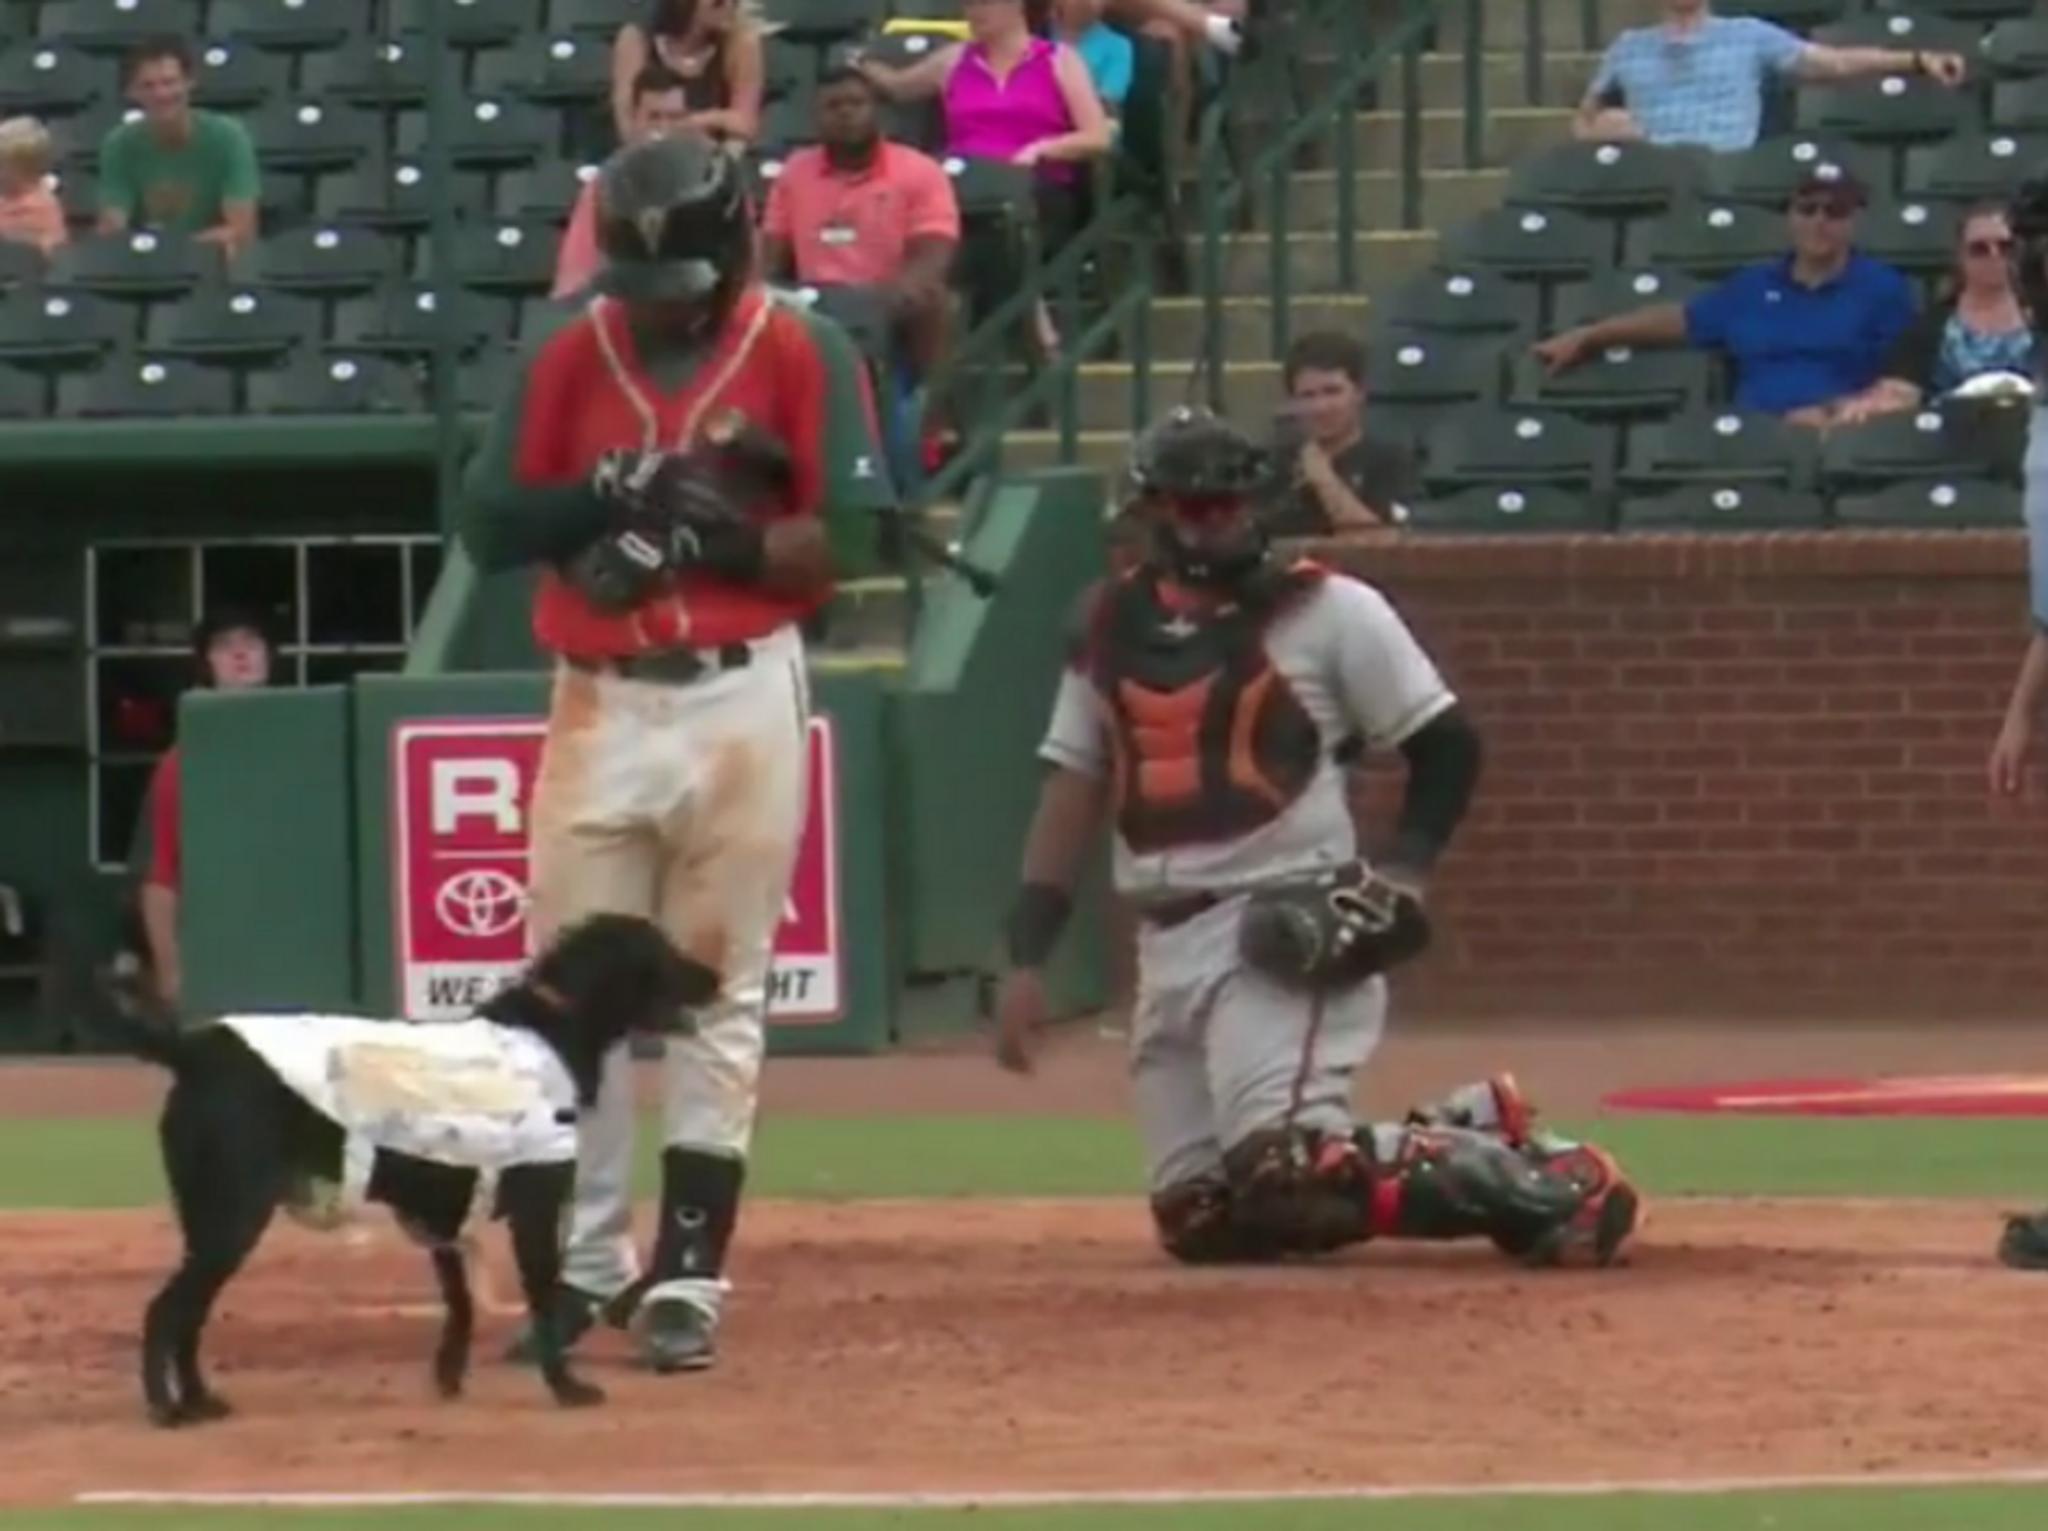 Minor league 'bat dog' tries to take player's bat before at-bat over - Washingto...